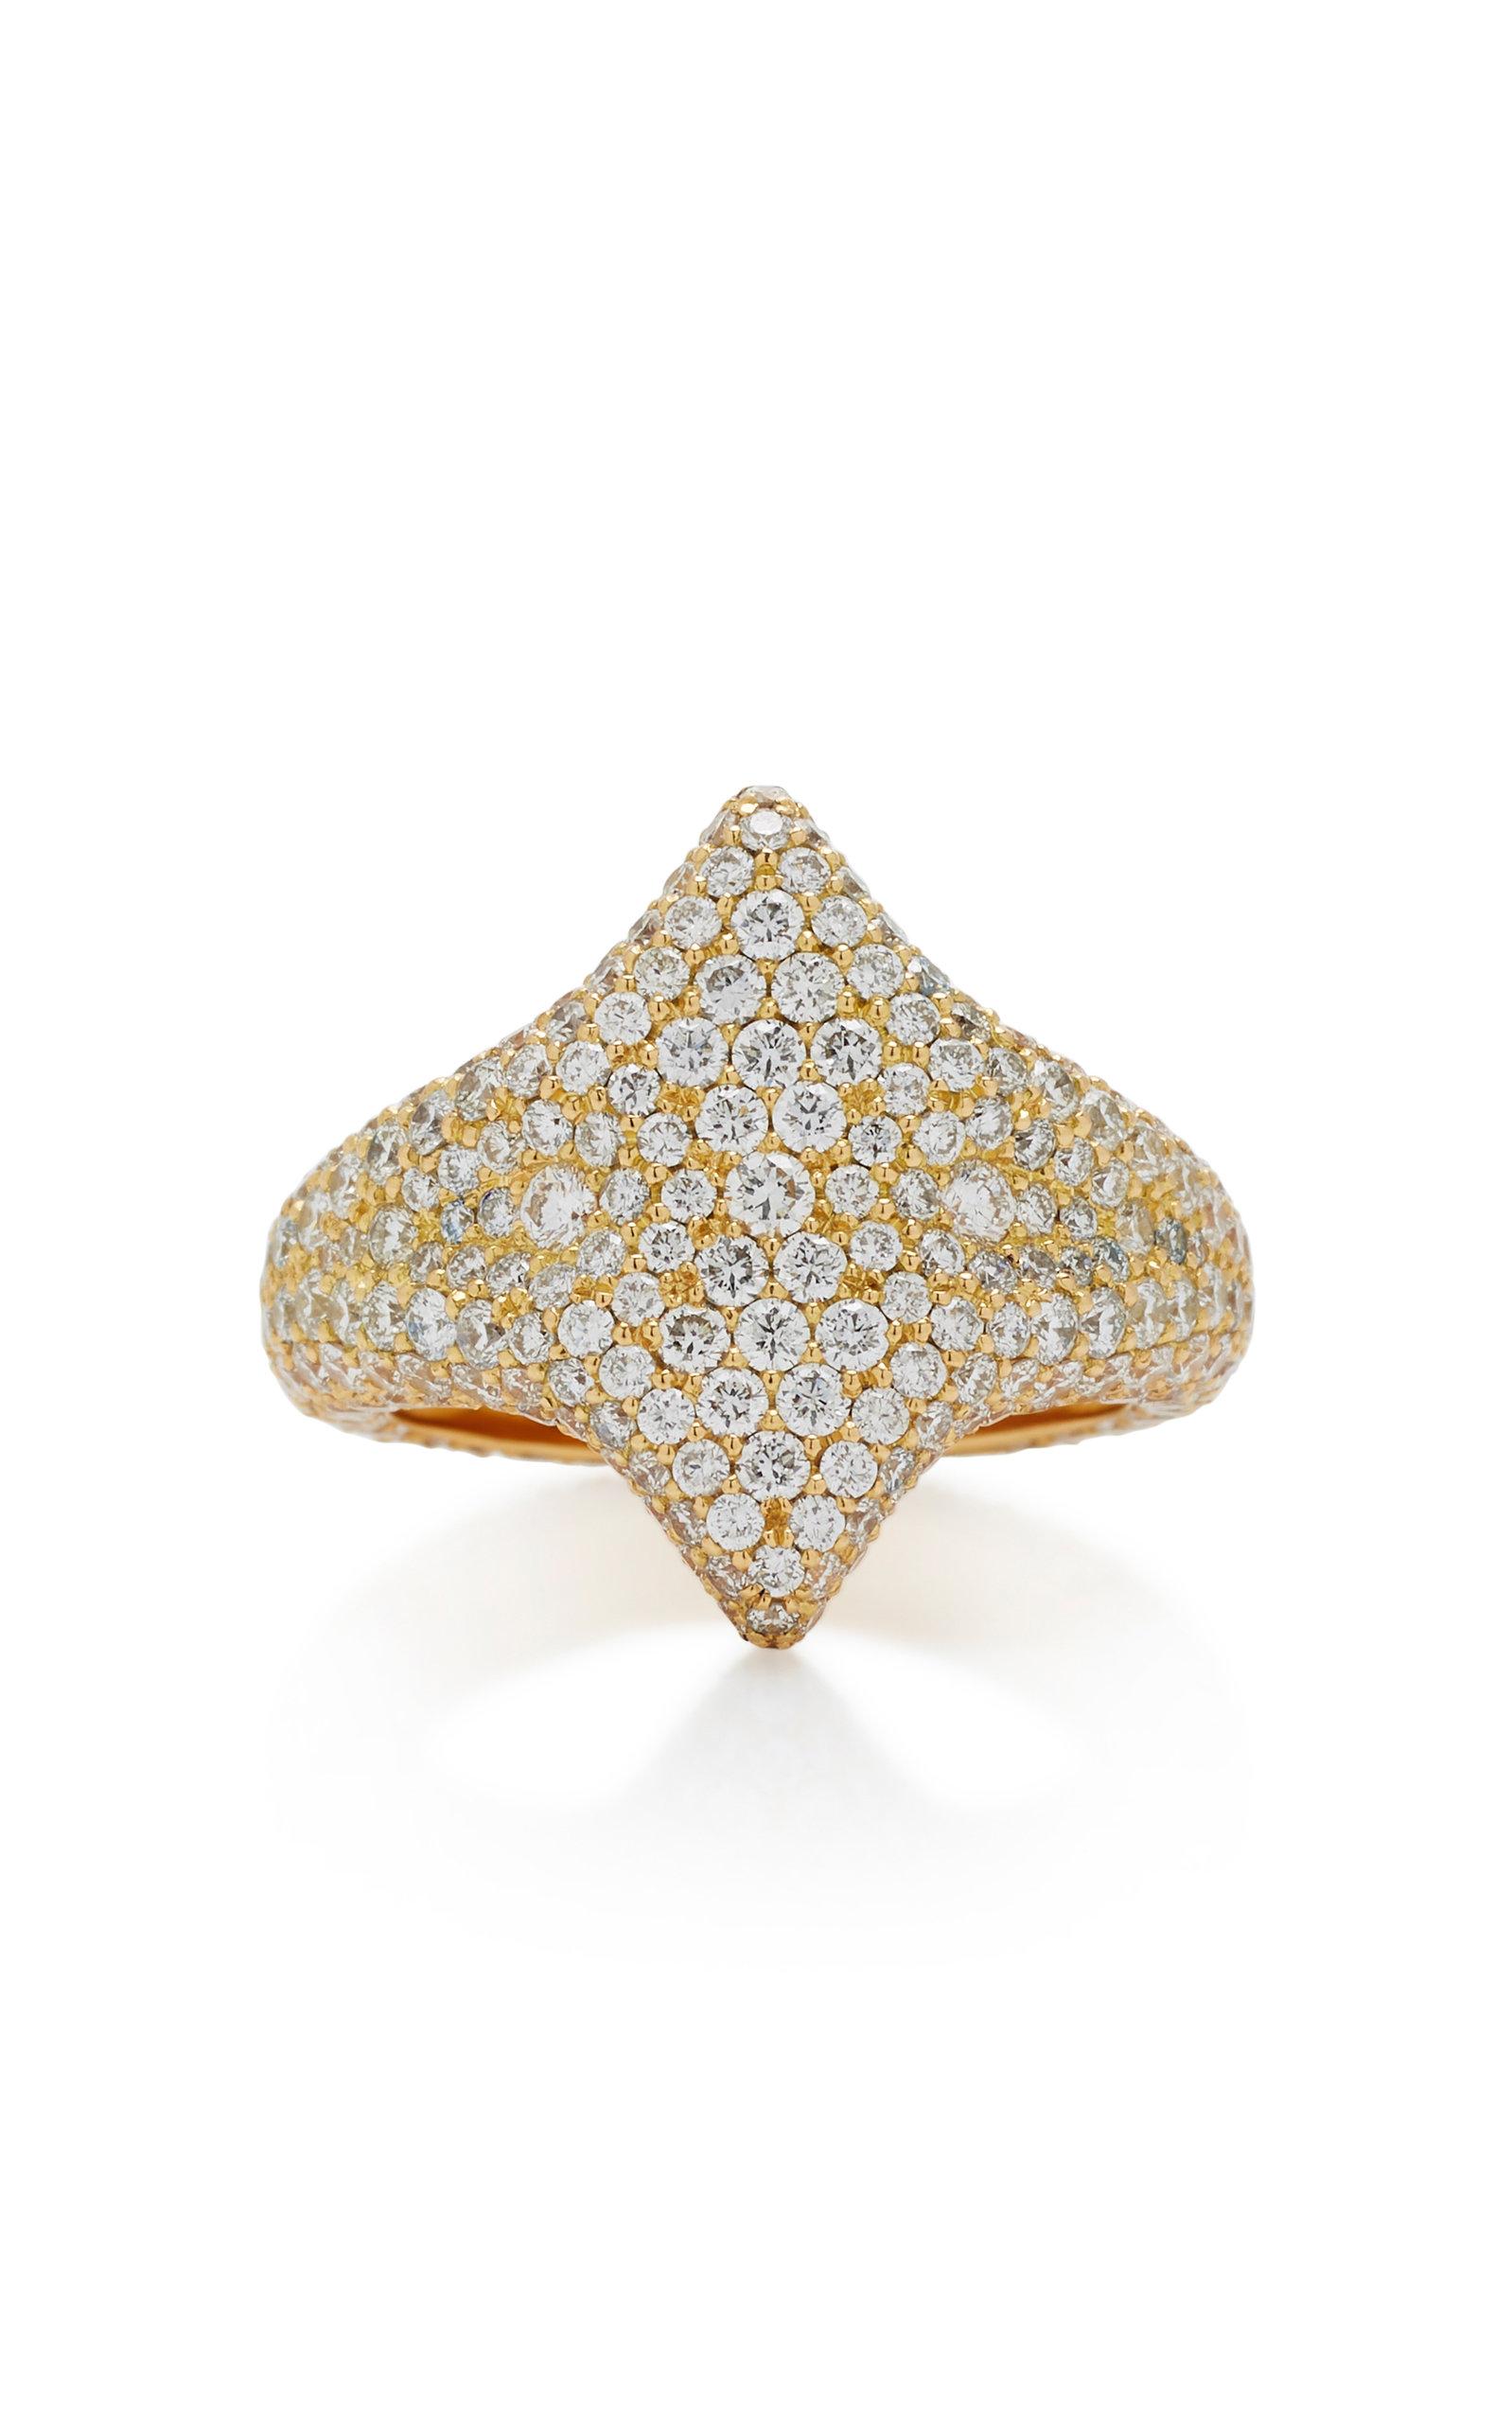 ILANA ARIEL Adina 18K Gold Diamond Signet Ring in White